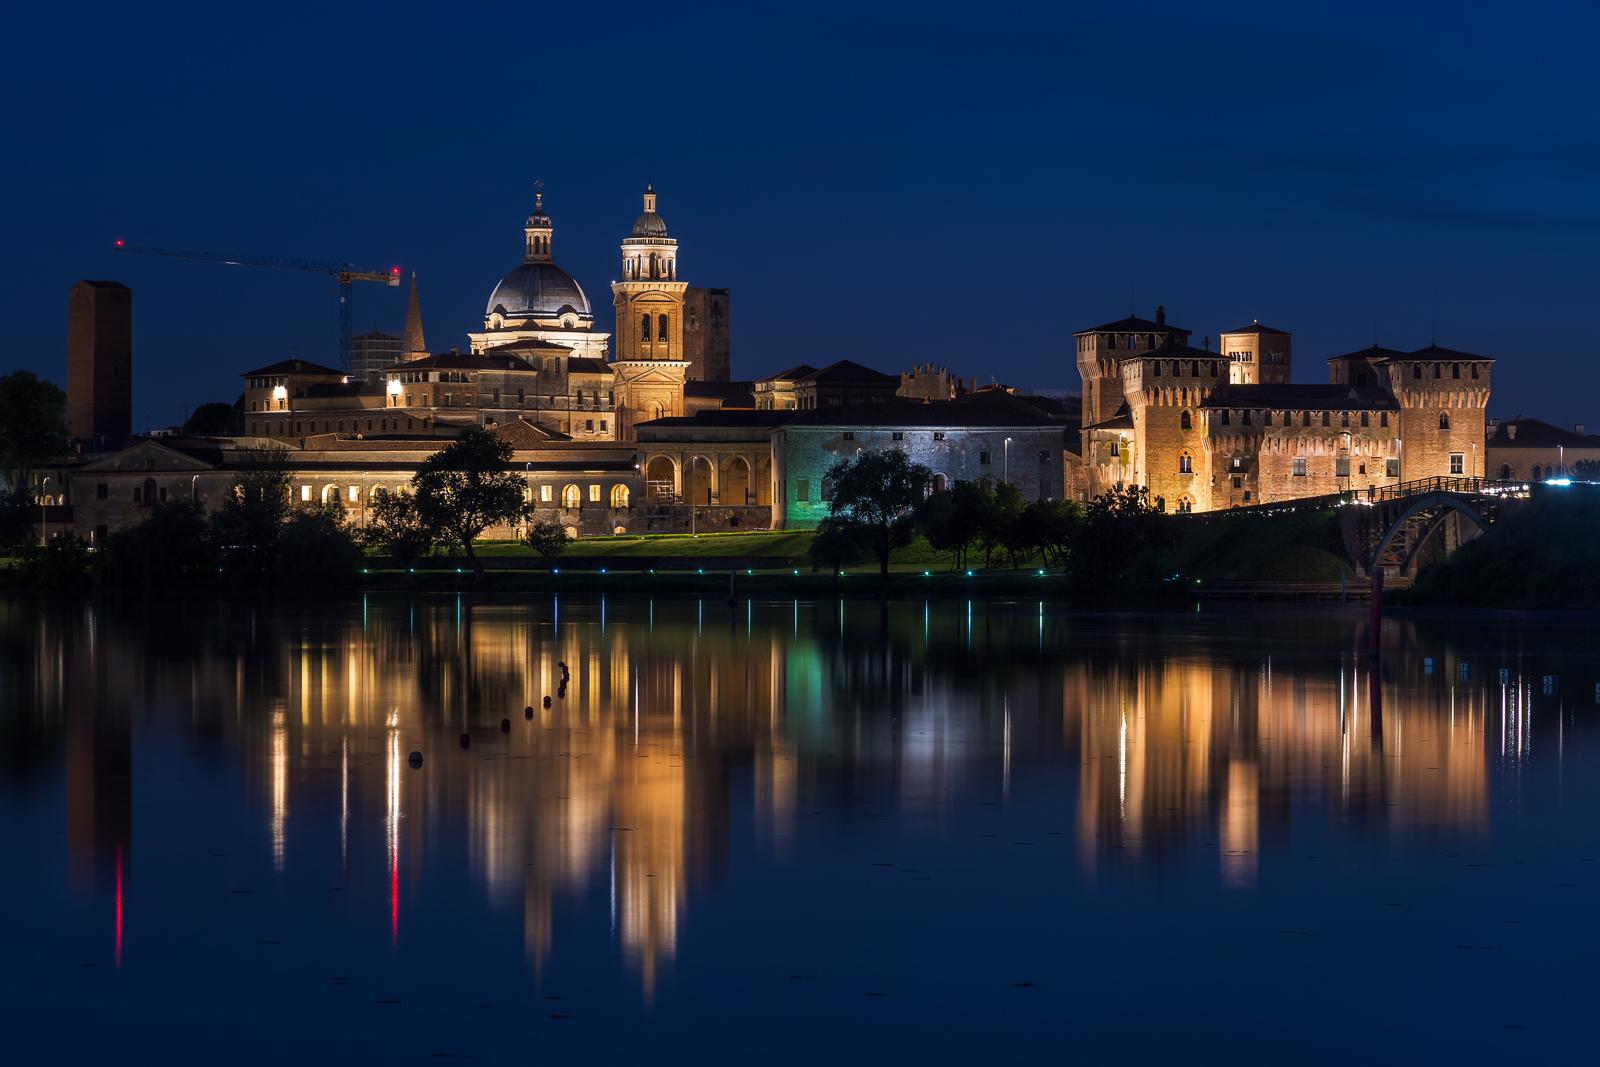 Mantova Blue now...